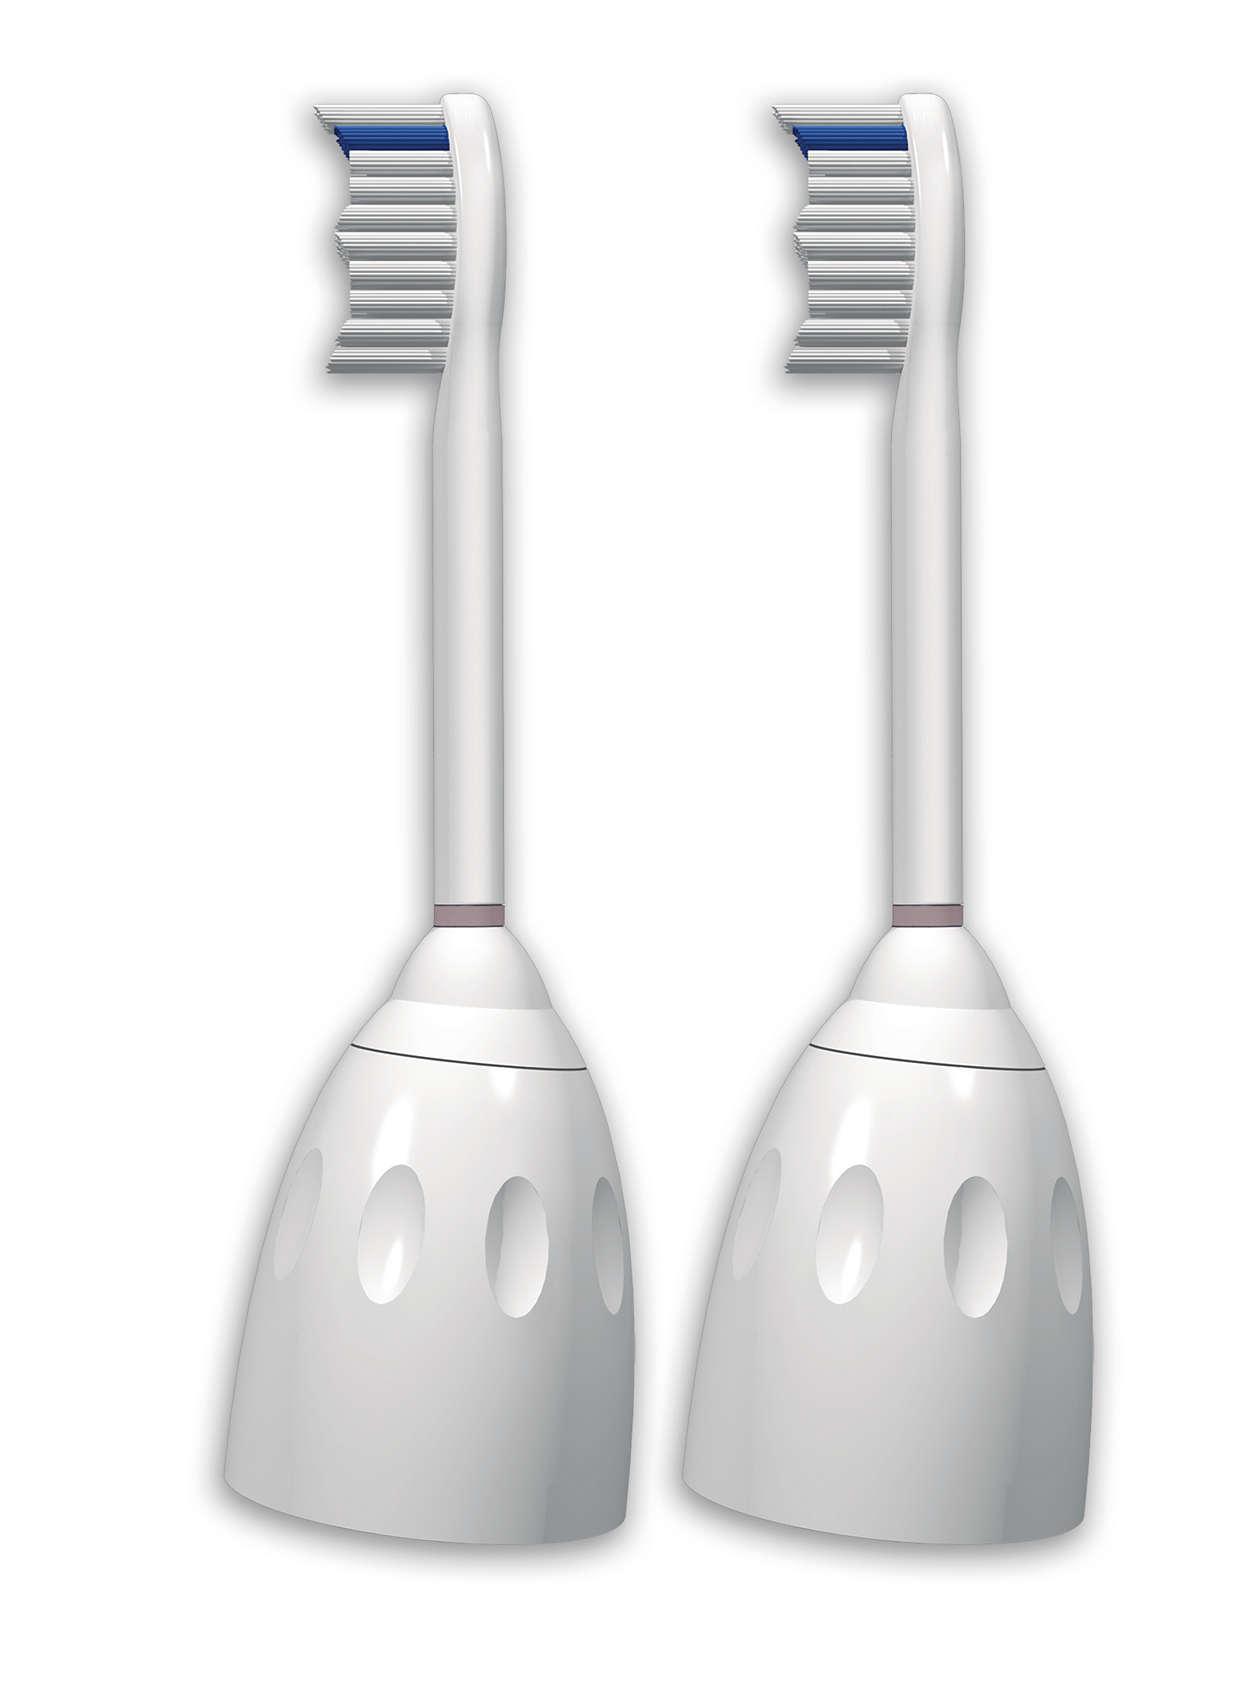 Classic power. Classic clean.